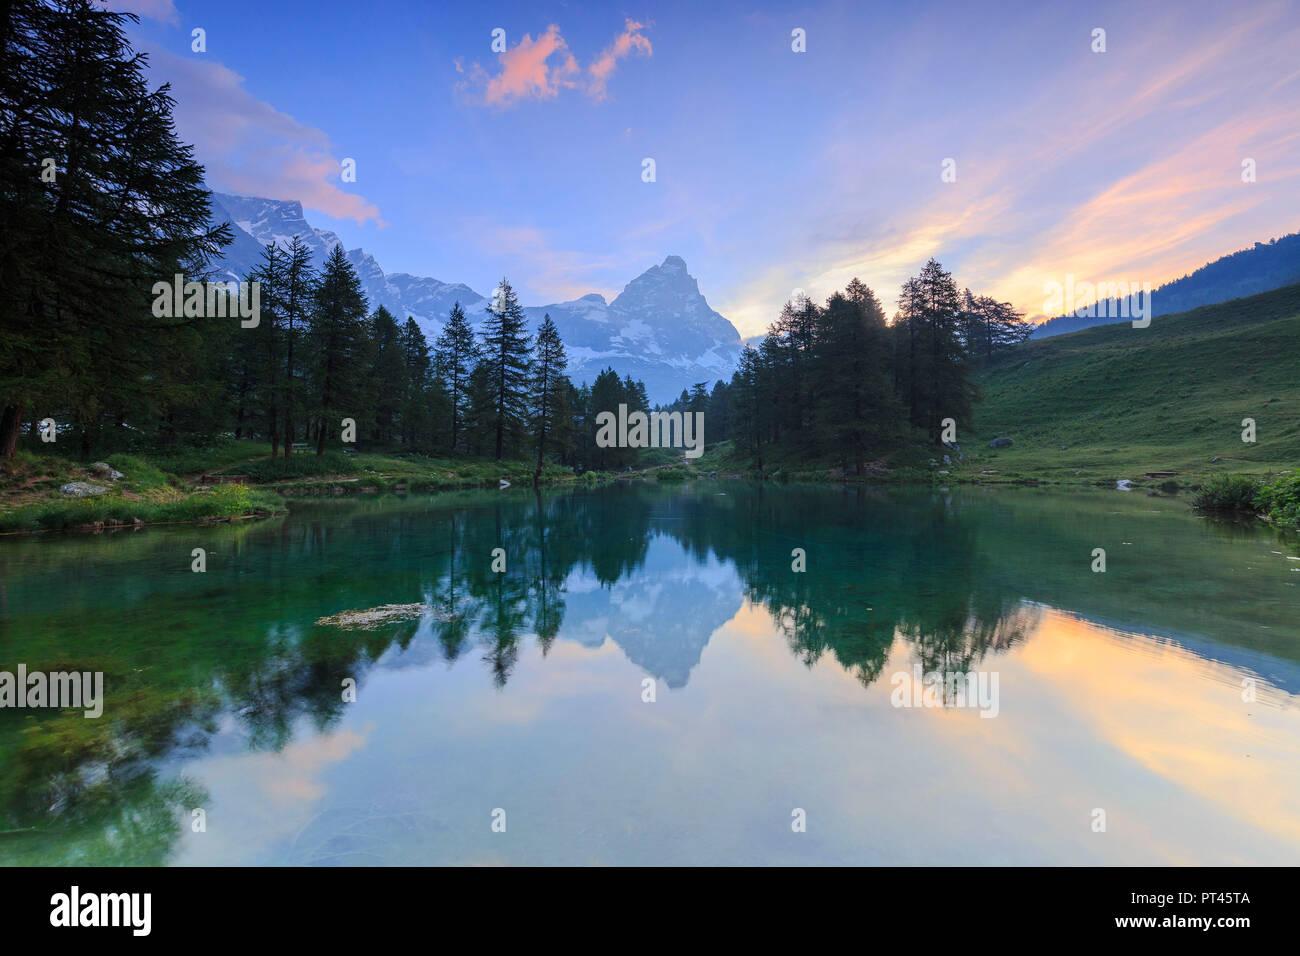 Sunrise from Blue Lake, Blu Lake, Cervinia, Valtournanche, Aosta valley, Italy, Europe - Stock Image